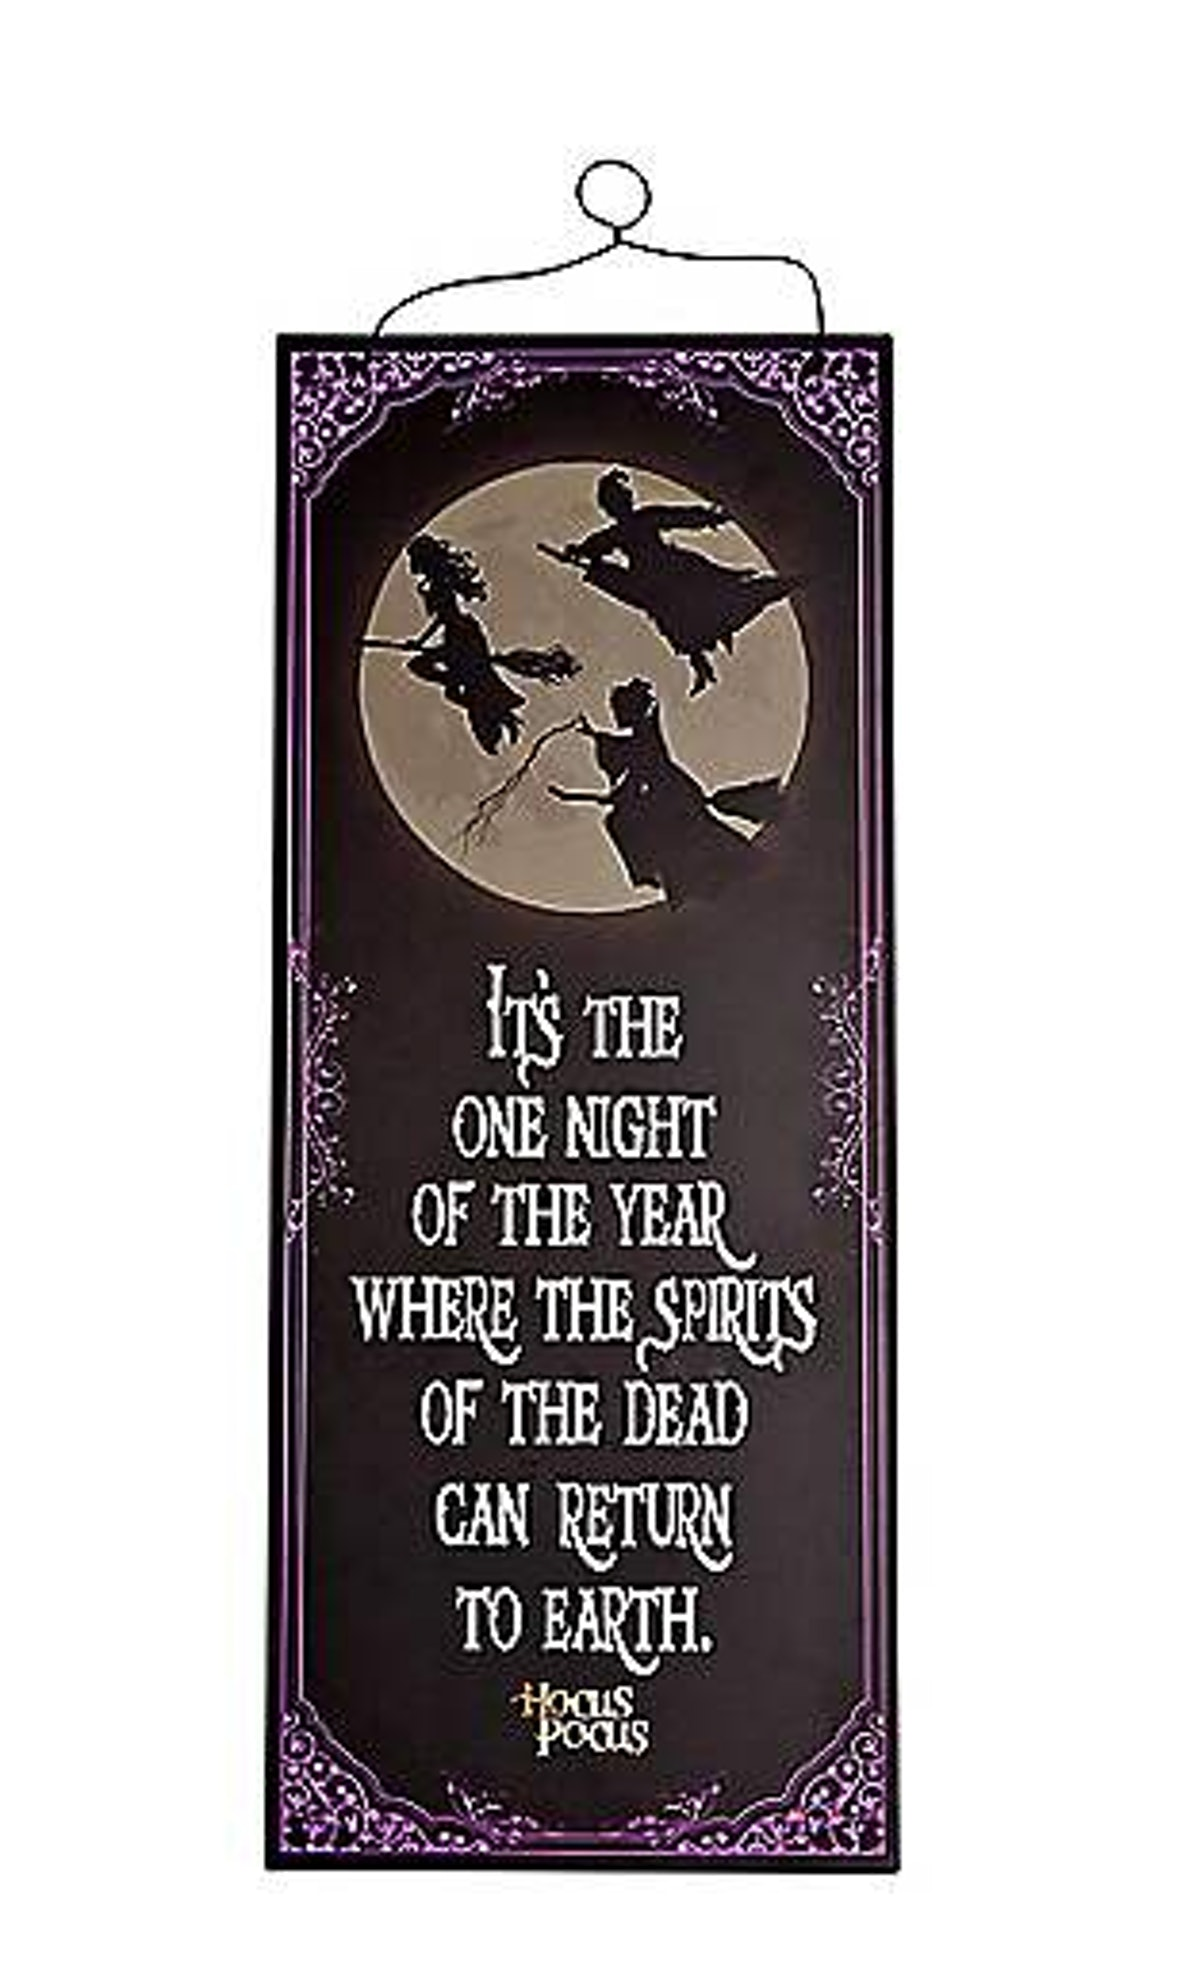 Spirits of the Dead Wooden Sign - Hocus Pocus